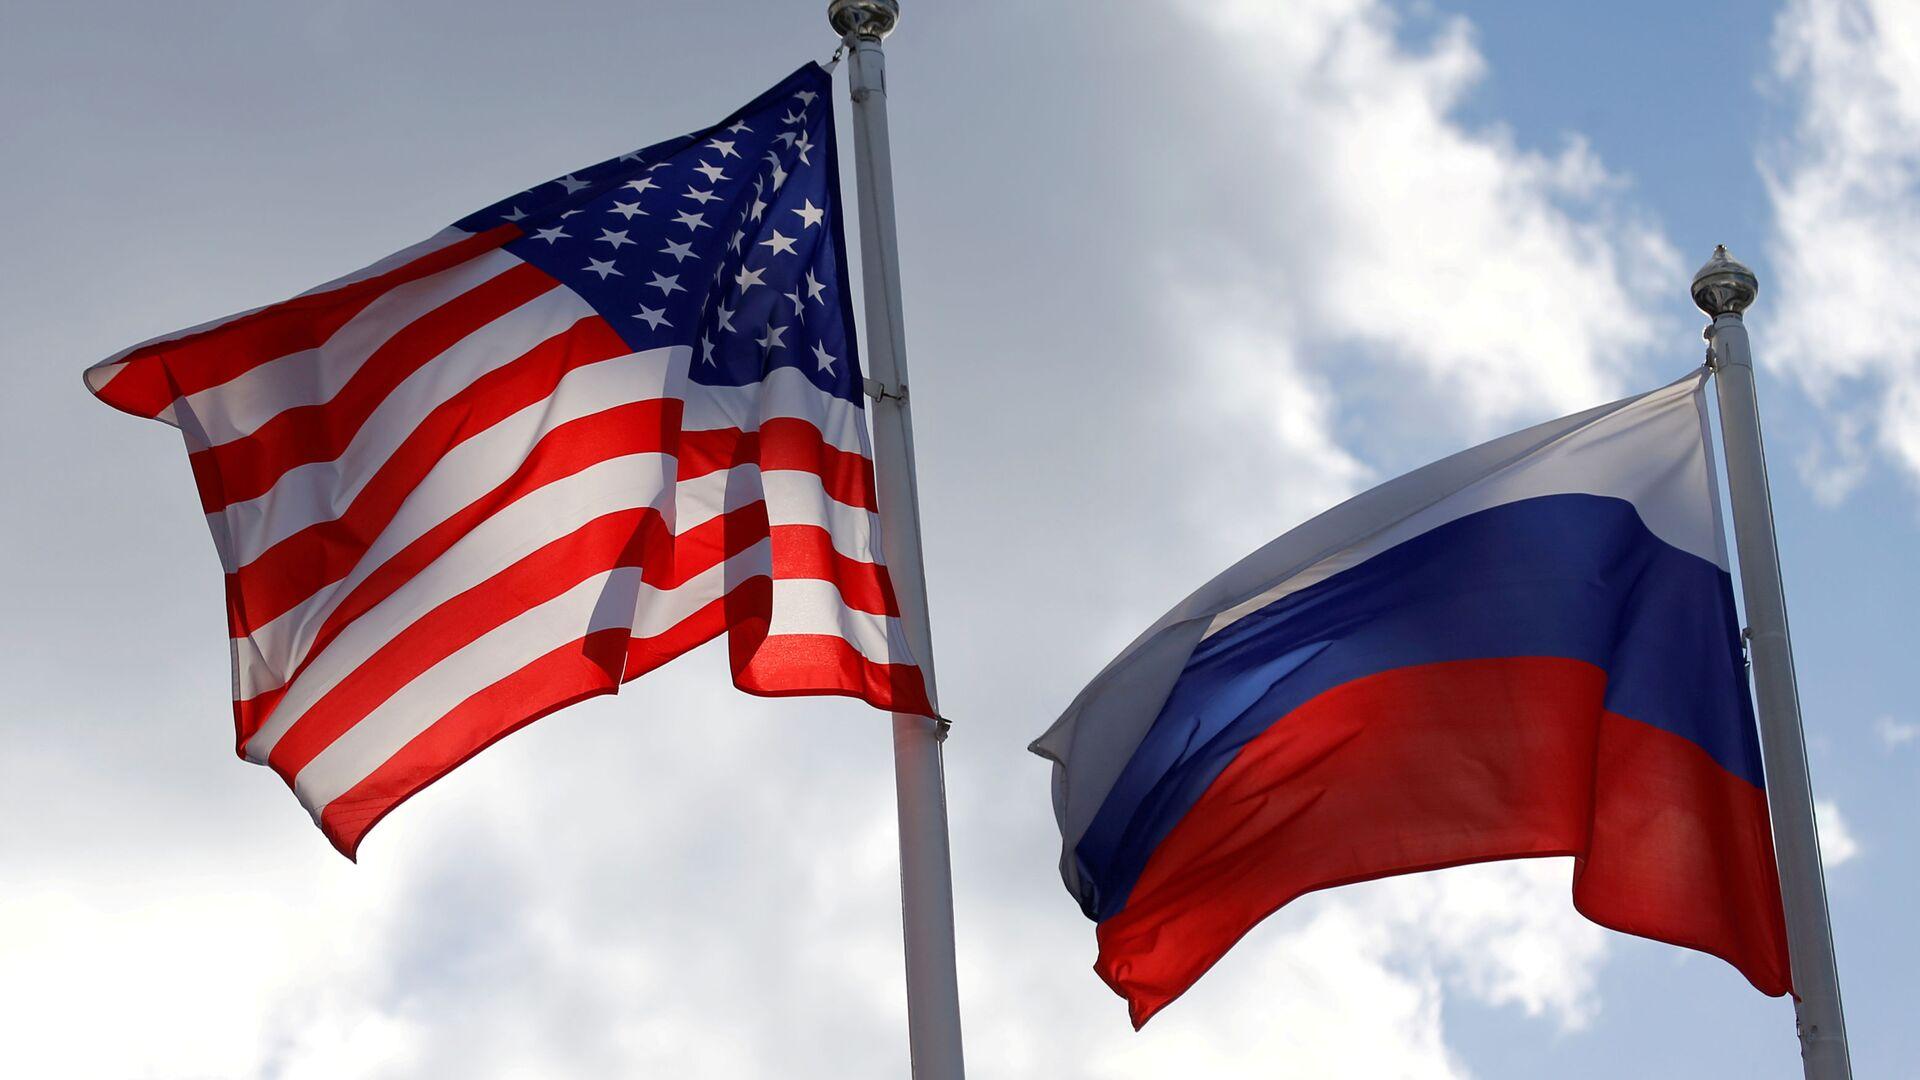 Russian and U.S. state flags fly near a factory in Vsevolozhsk, Leningrad Region, Russia March 27, 2019 - Sputnik International, 1920, 23.09.2021